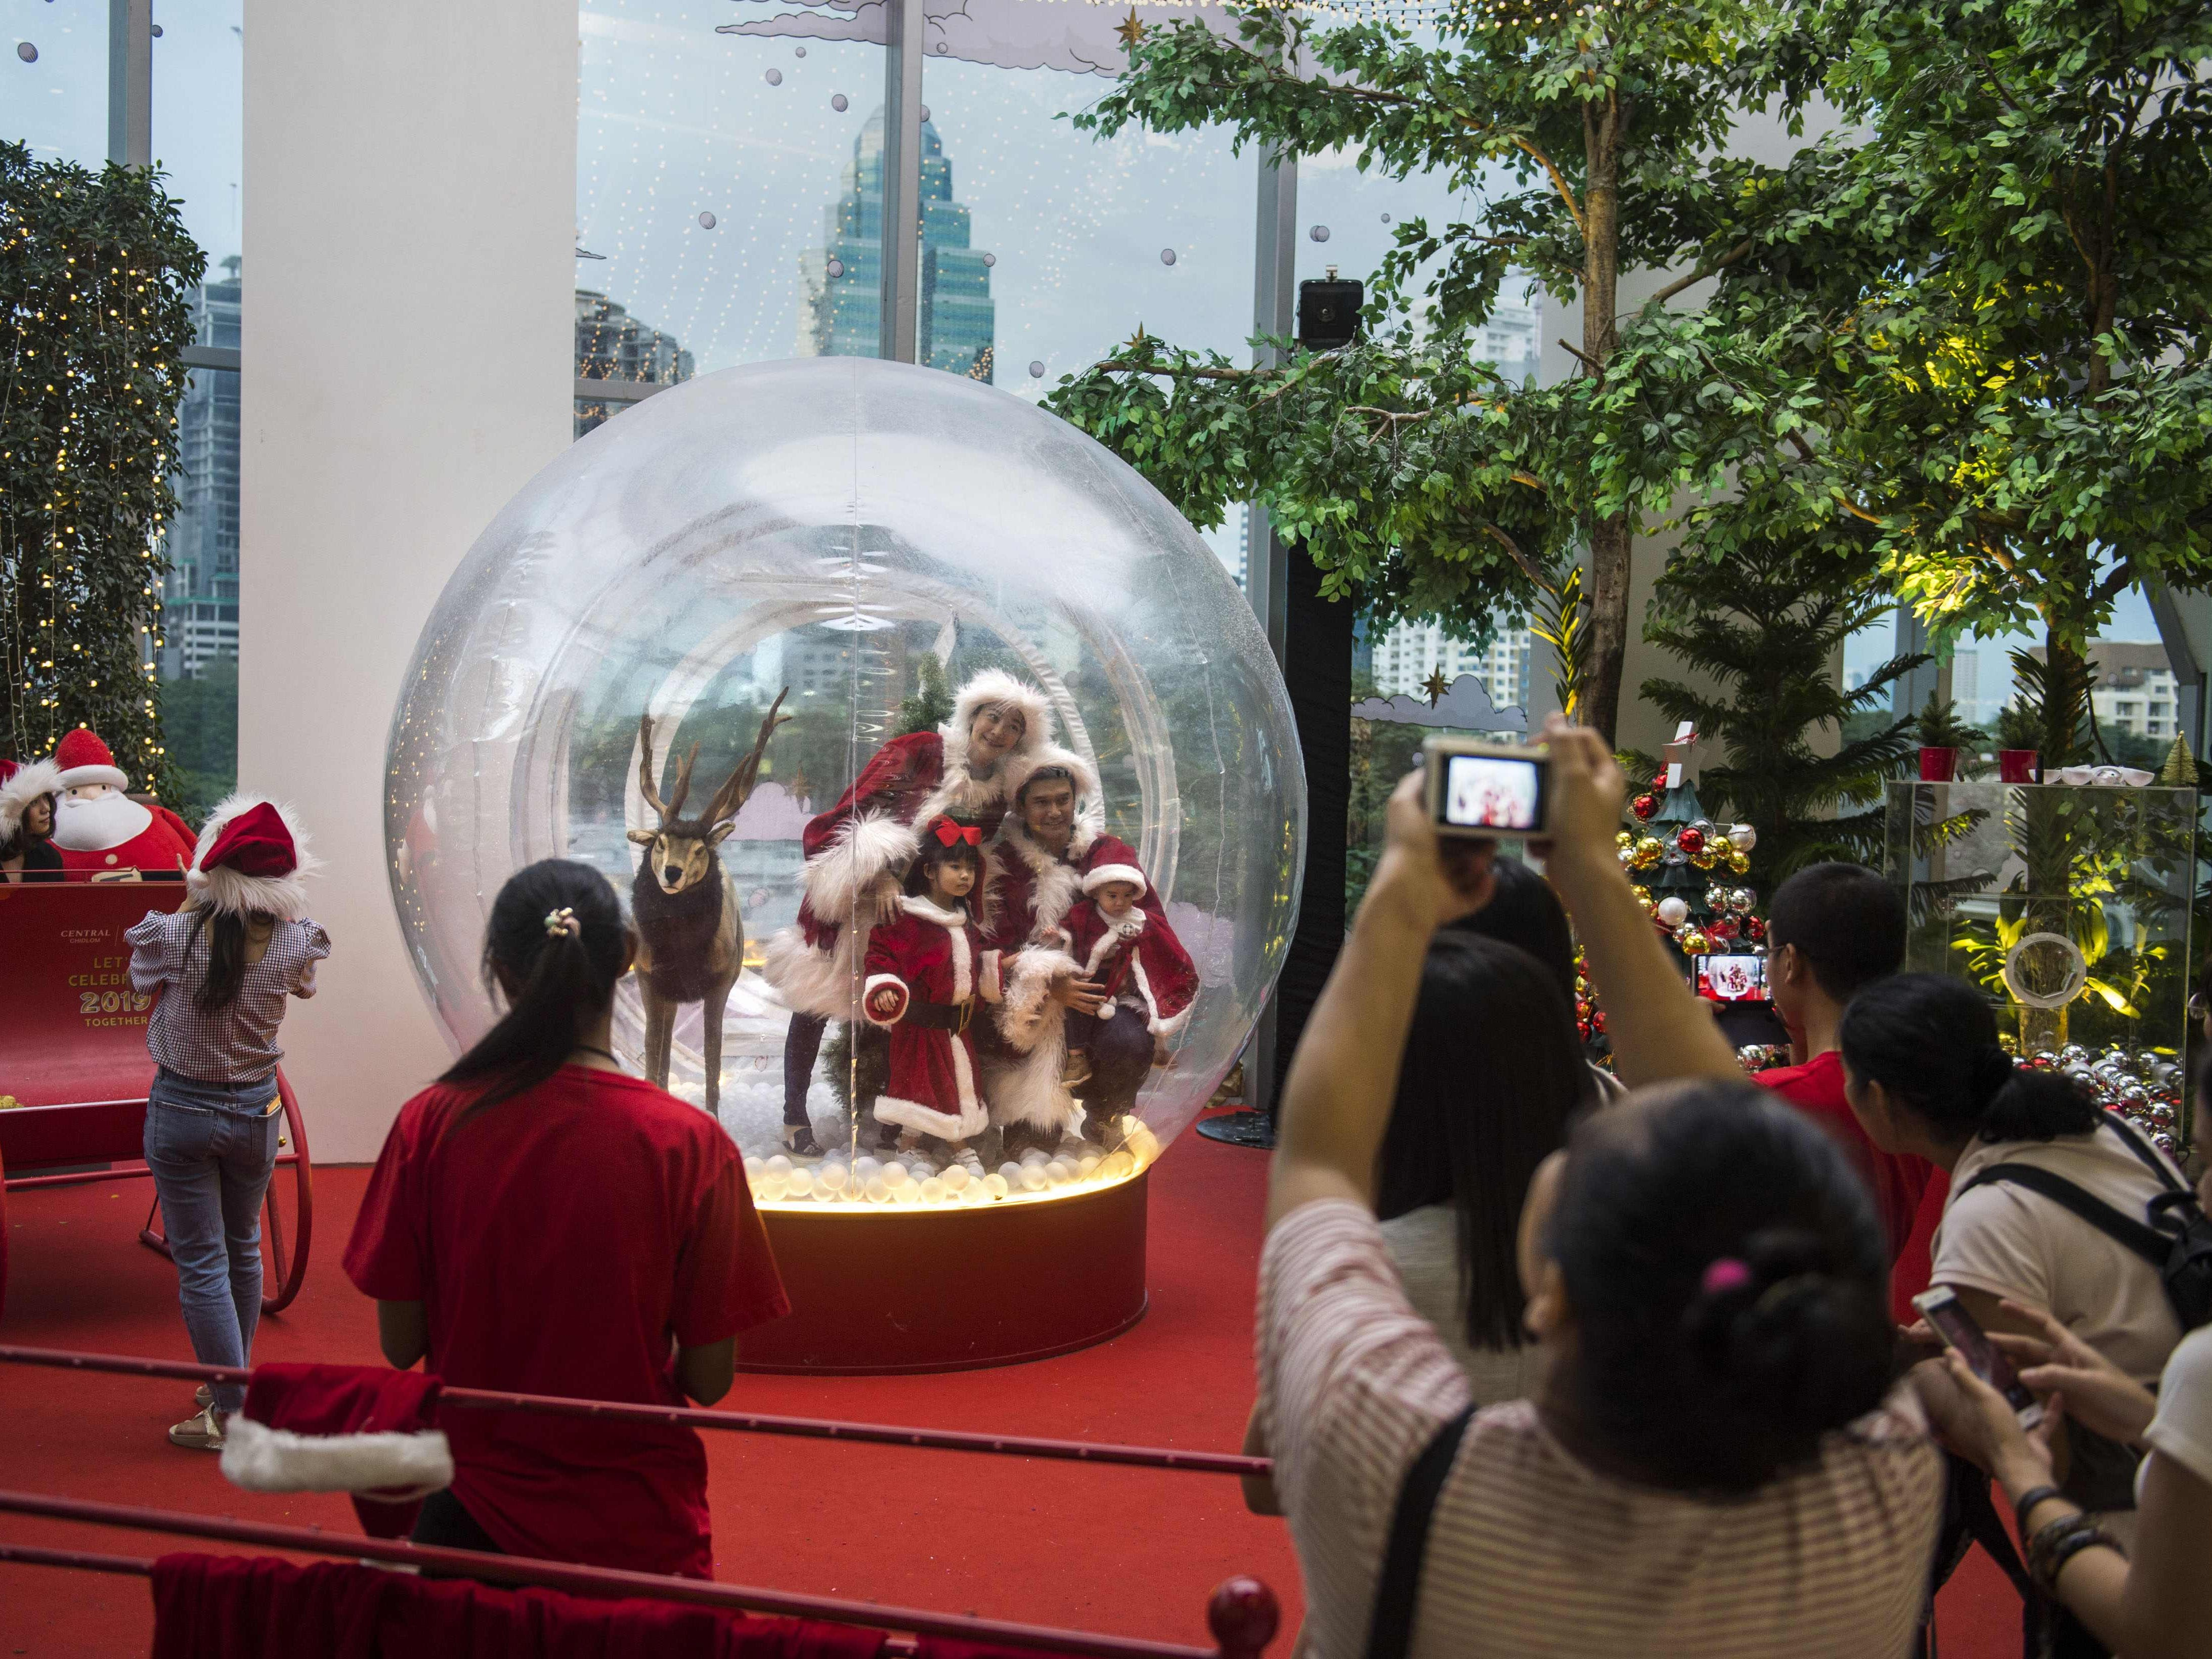 A family wearing Santa costumes poses inside a Christmas decoration at a mall in Bangkok Dec. 9, 2018.